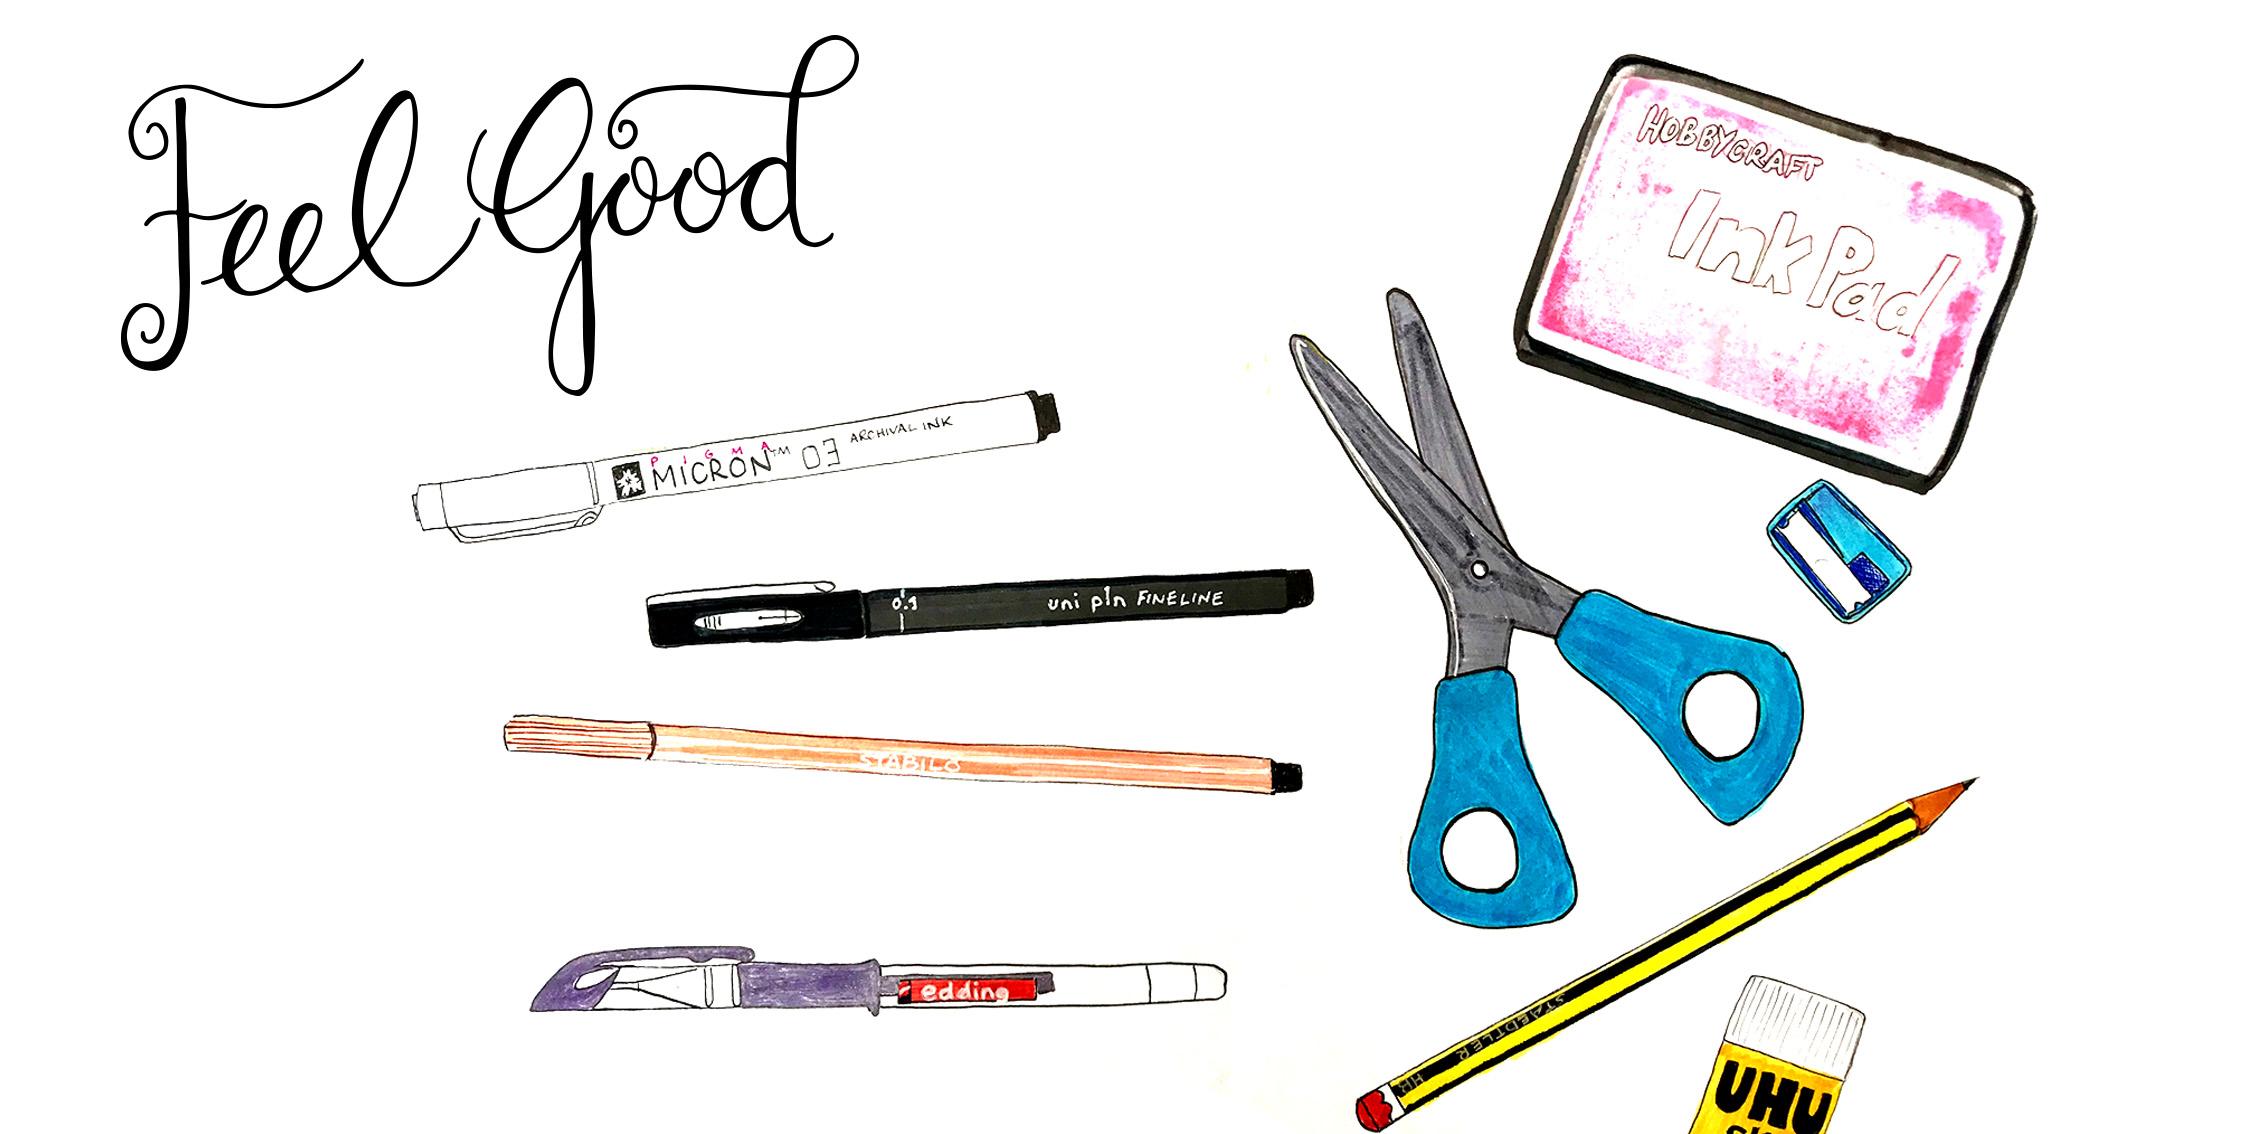 Hand drawn pens, pencils, scissors, ink pad